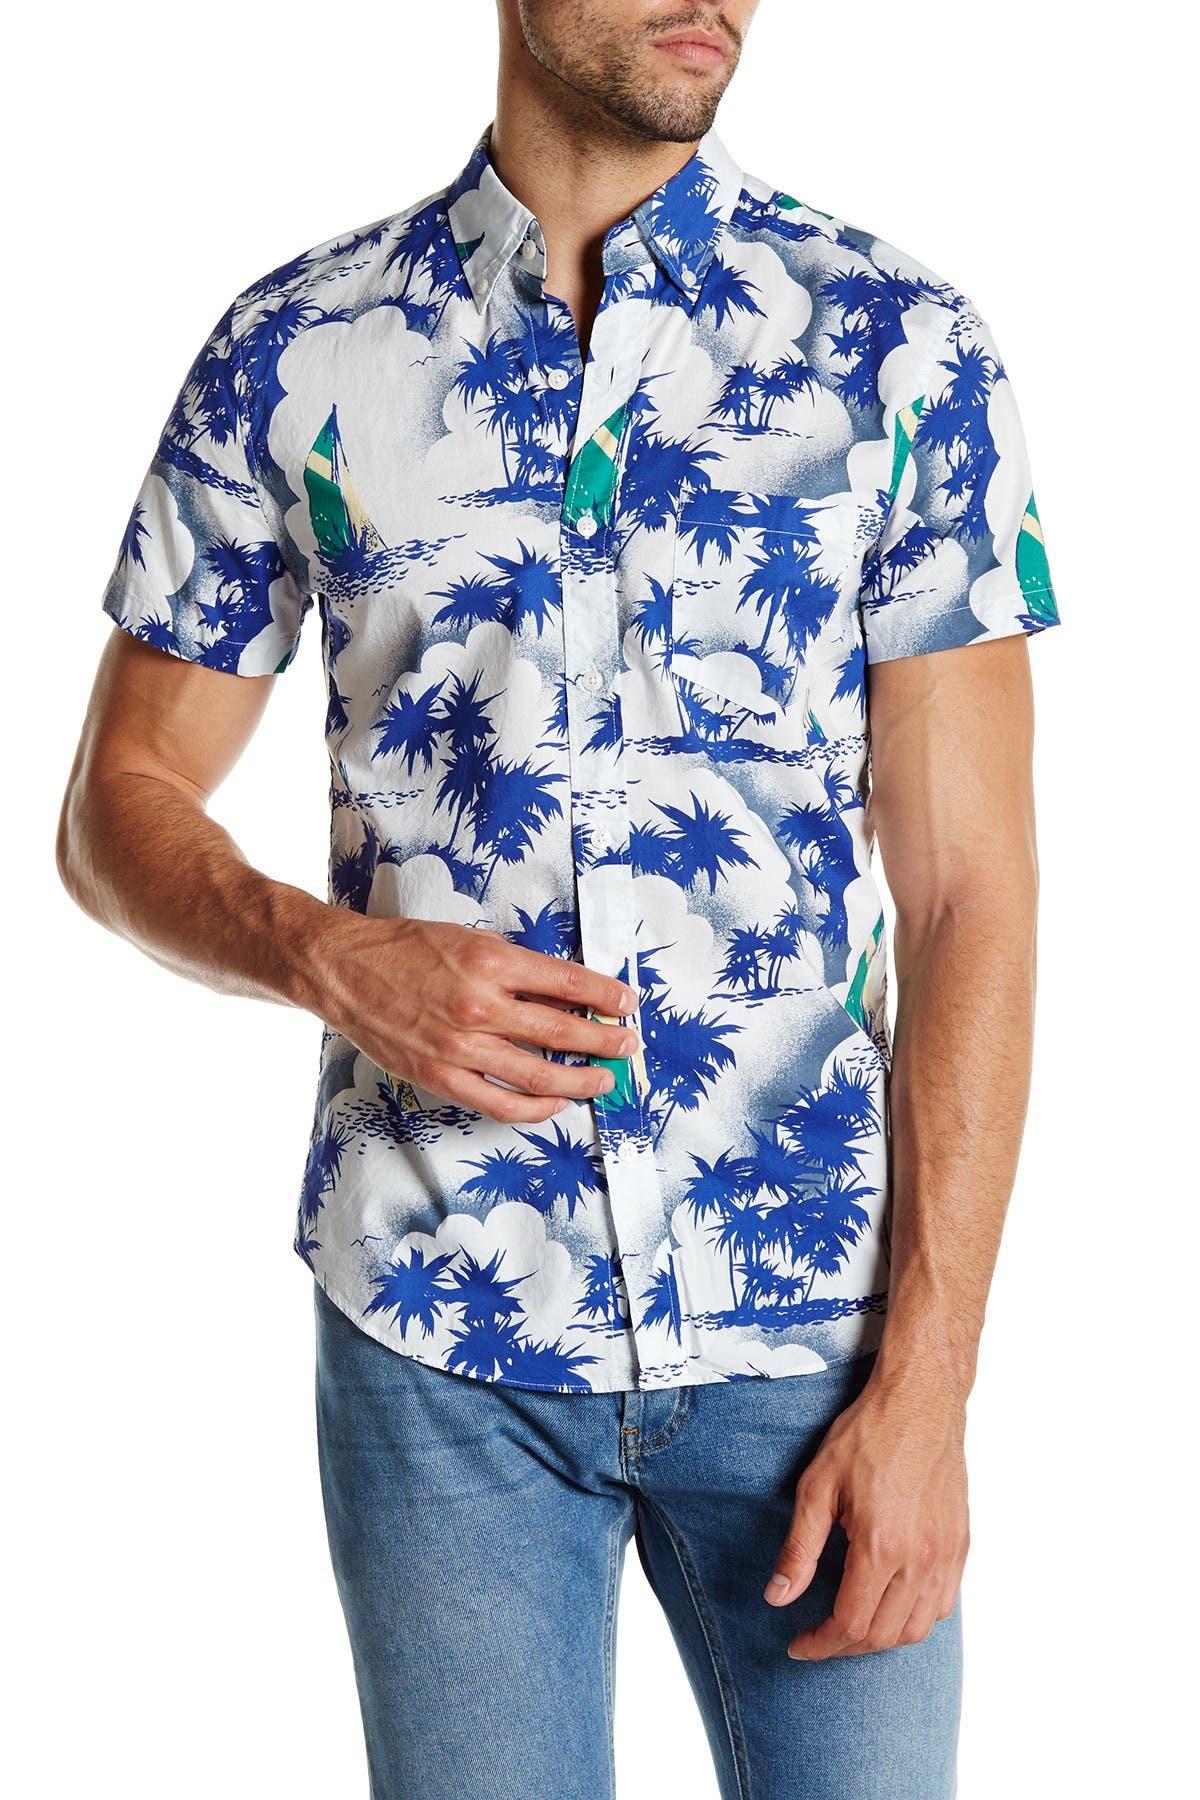 Image of J. Crew Factory Slim Fit Printed Short Sleeve Shirt